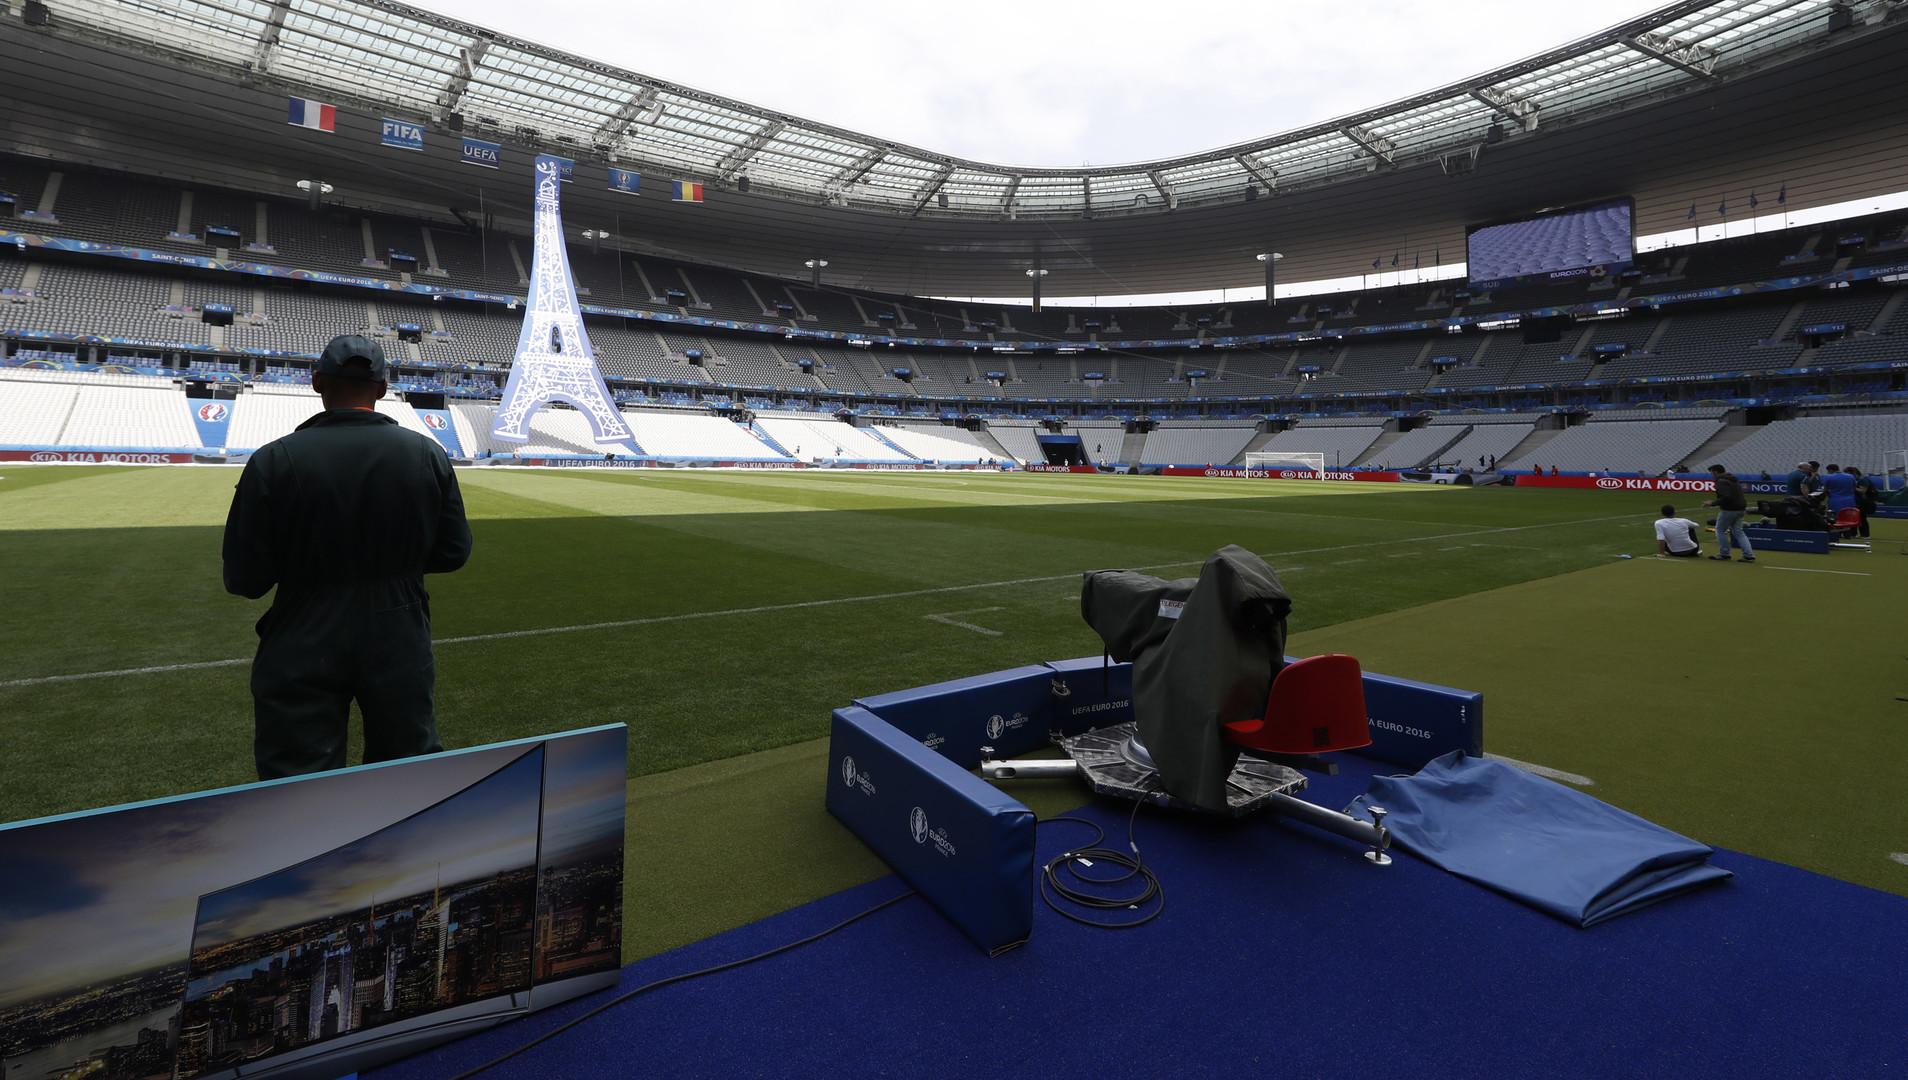 Дэвид Гетта станет хедлайнером церемонии открытия Евро-2016